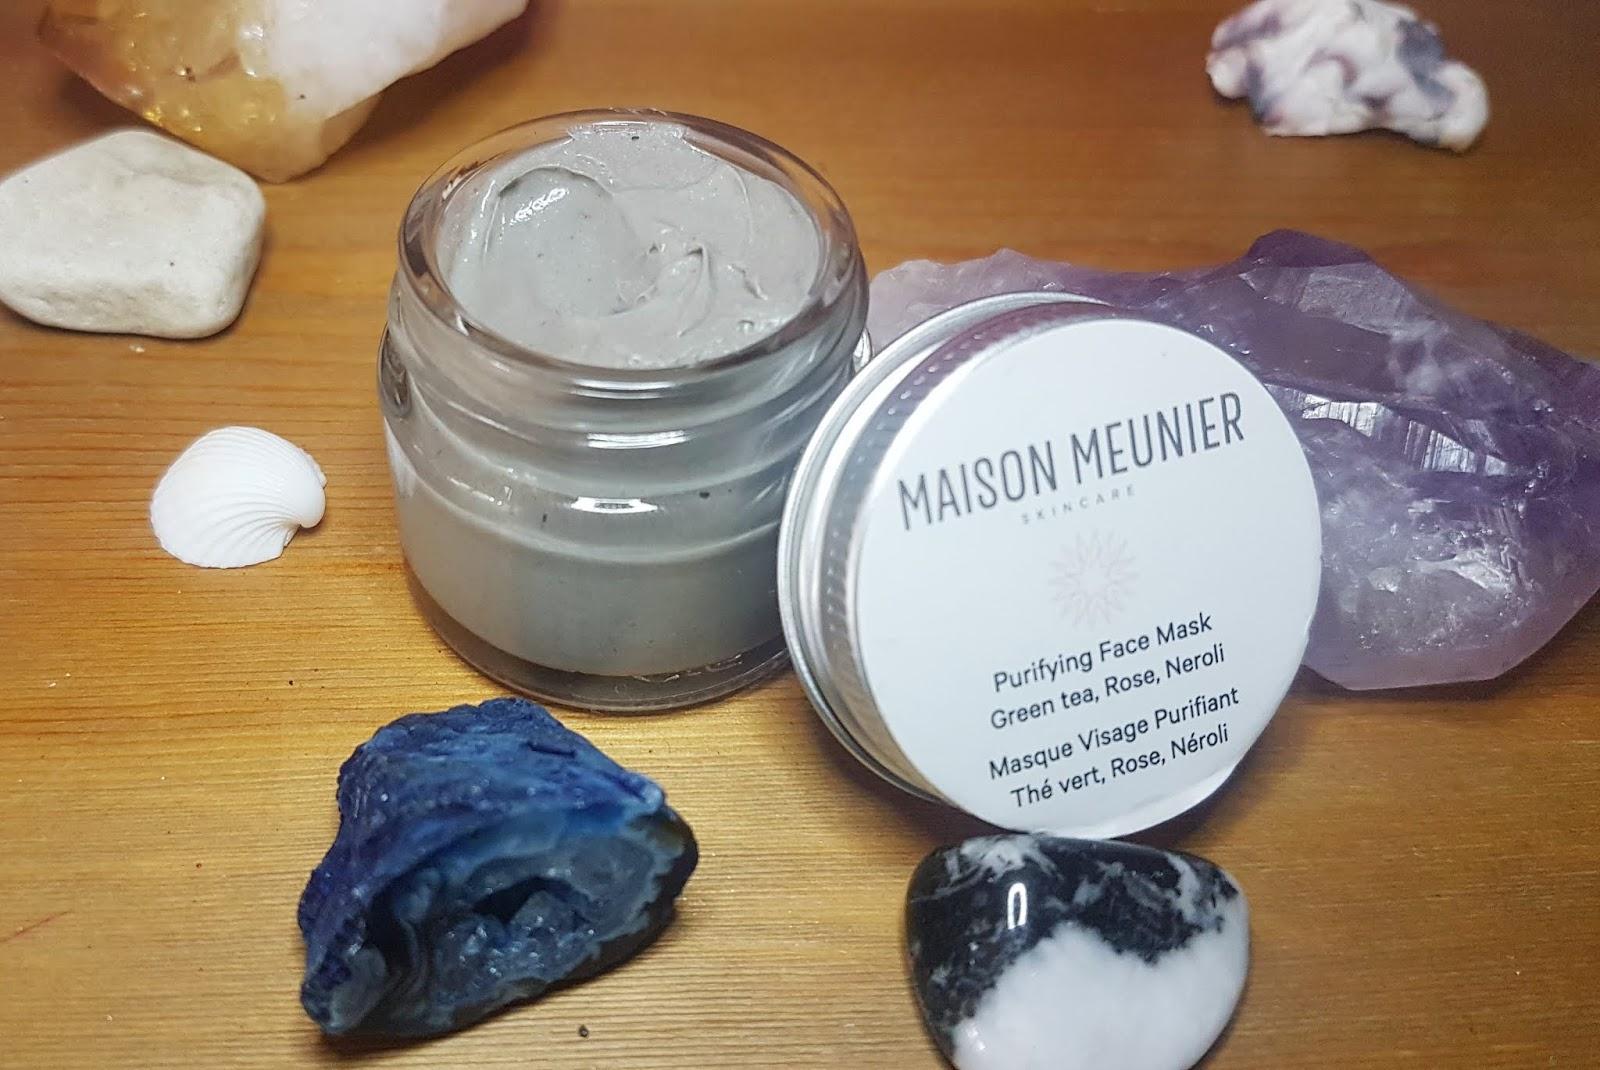 Maison Meunier Purifying Face Mask Review